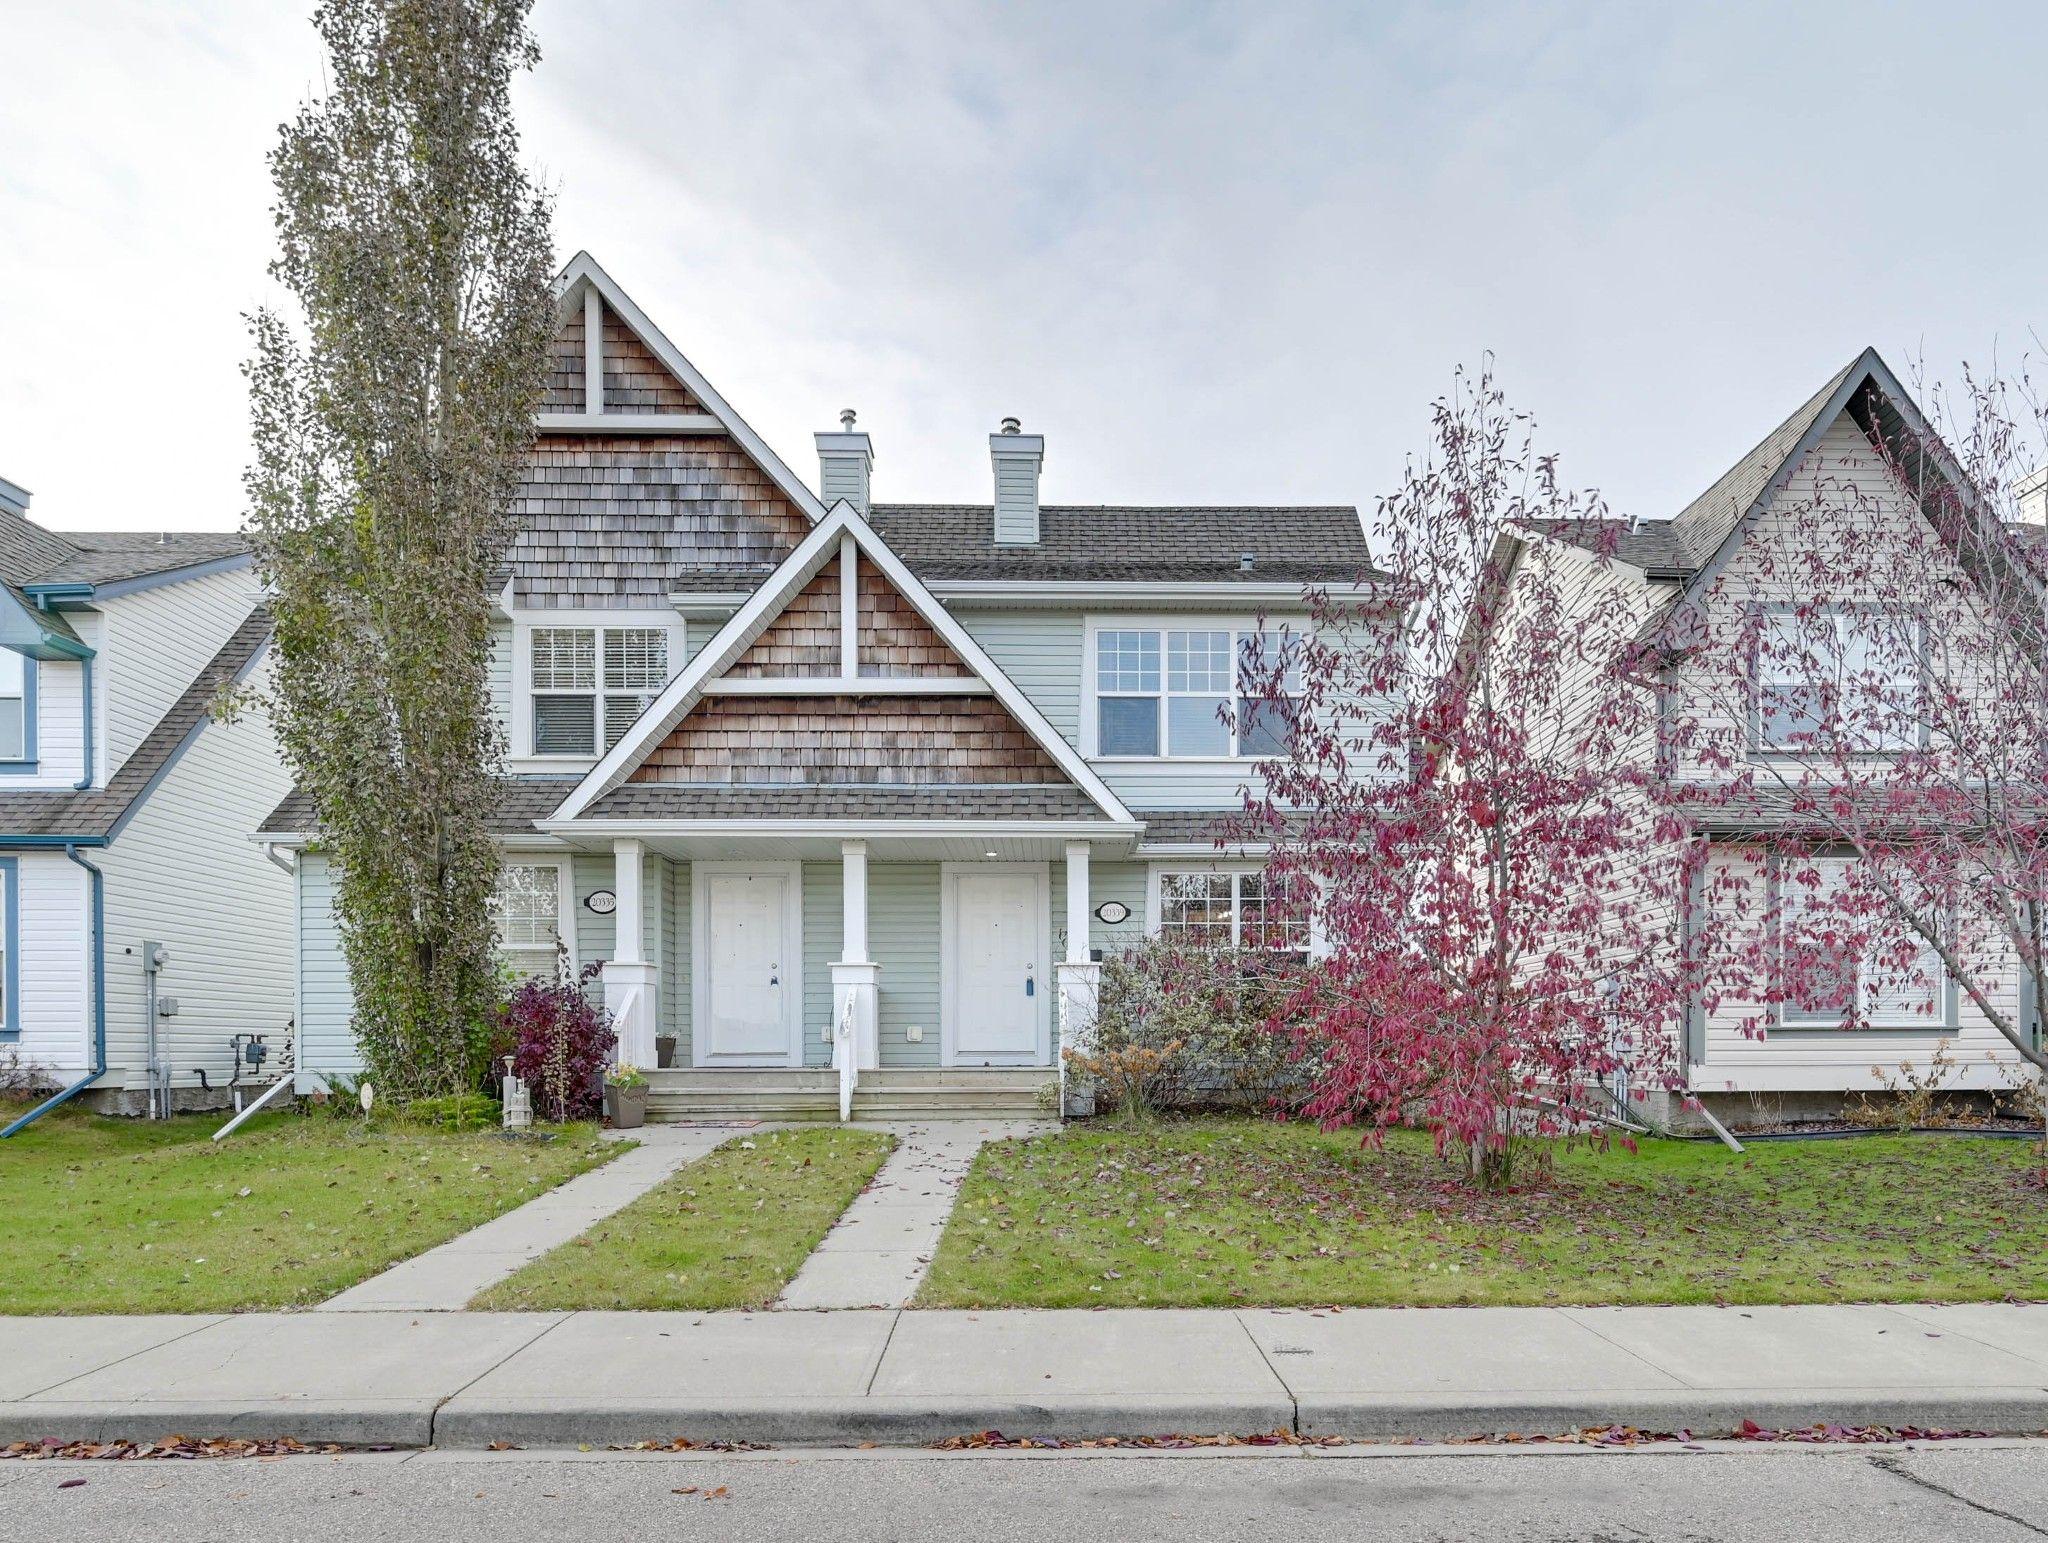 Main Photo: 20339 - 56 Avenue in Edmonton: Hamptons House Half Duplex for sale : MLS®# E4177430